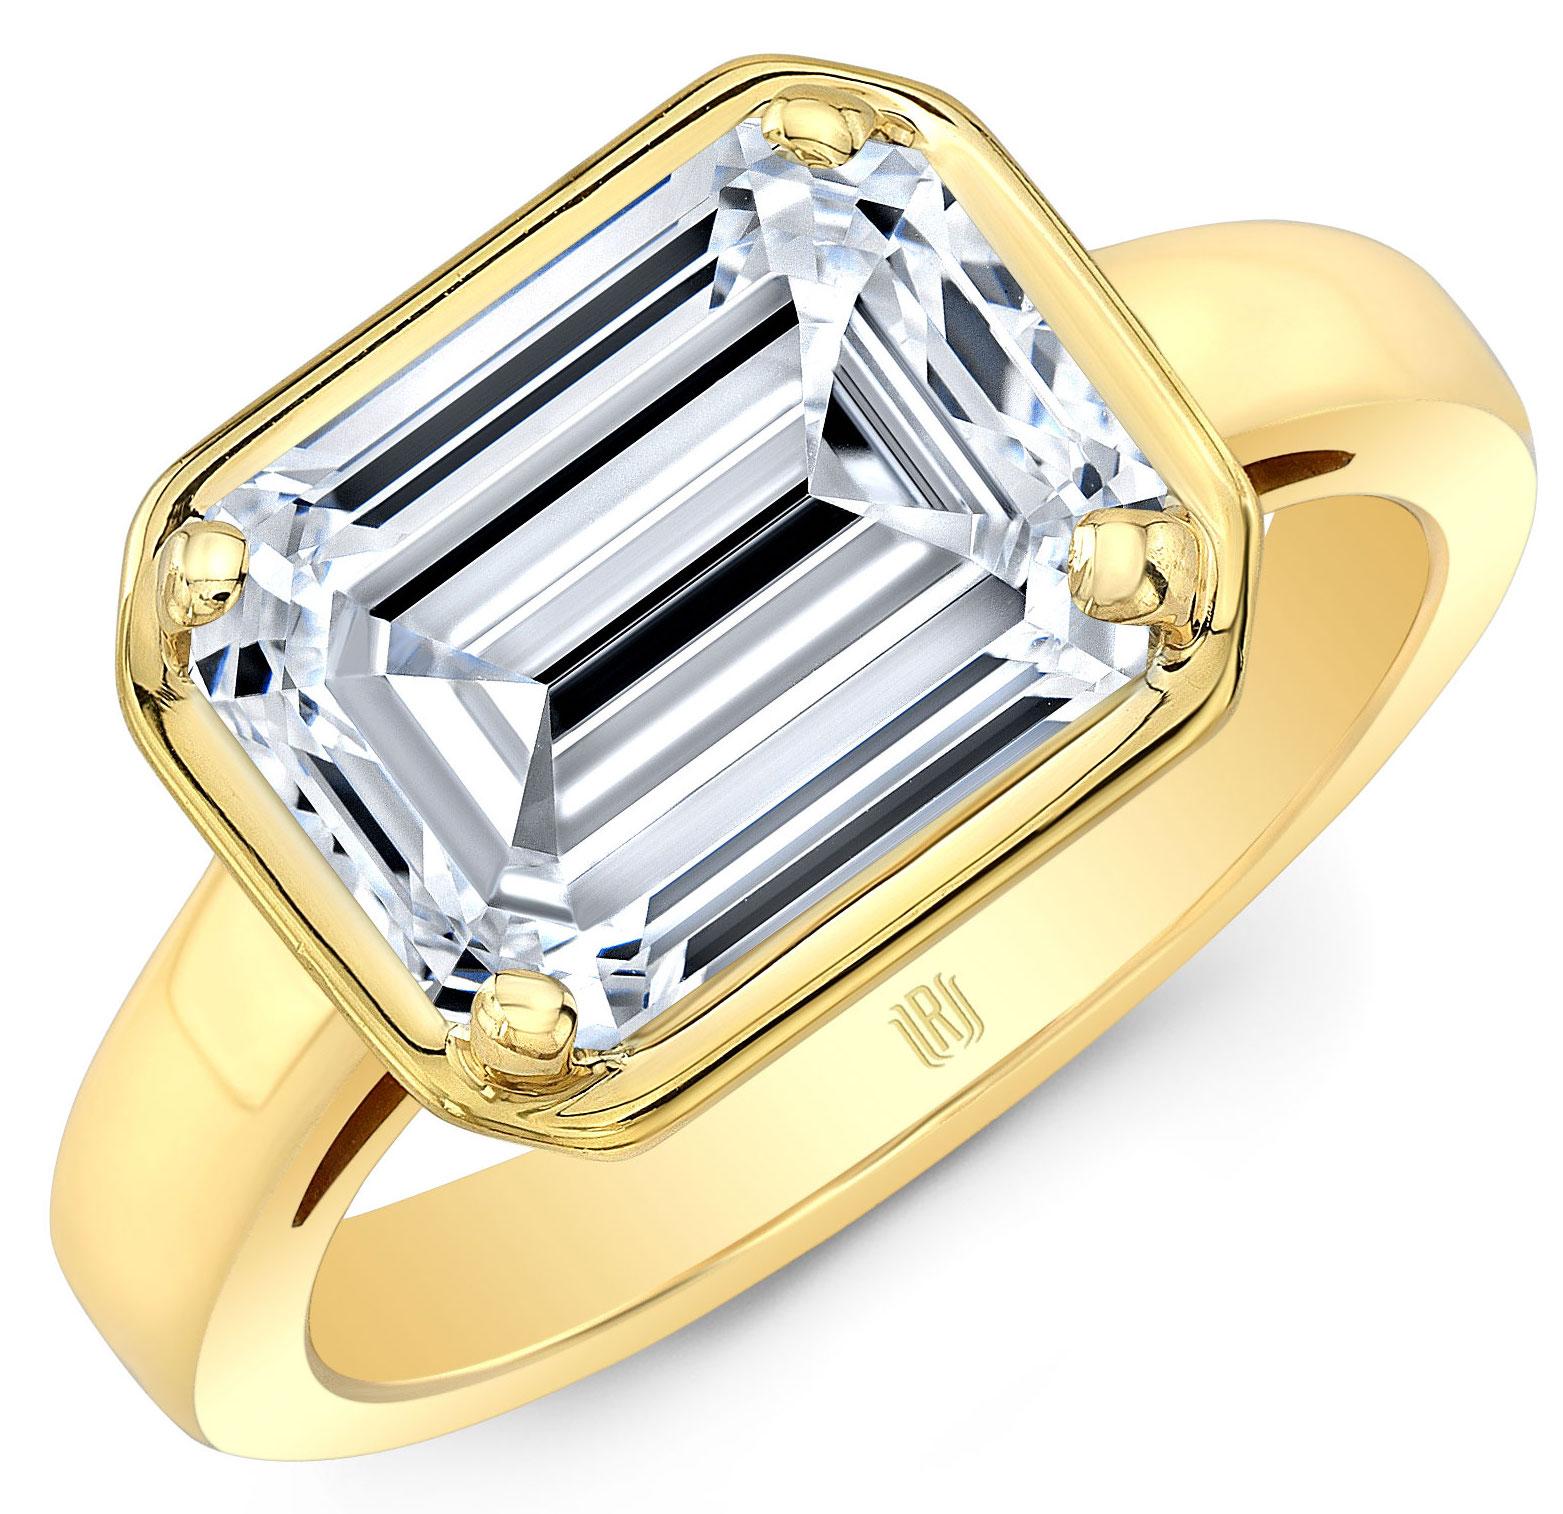 Rahaminov diamond ring | JCK On Your Market